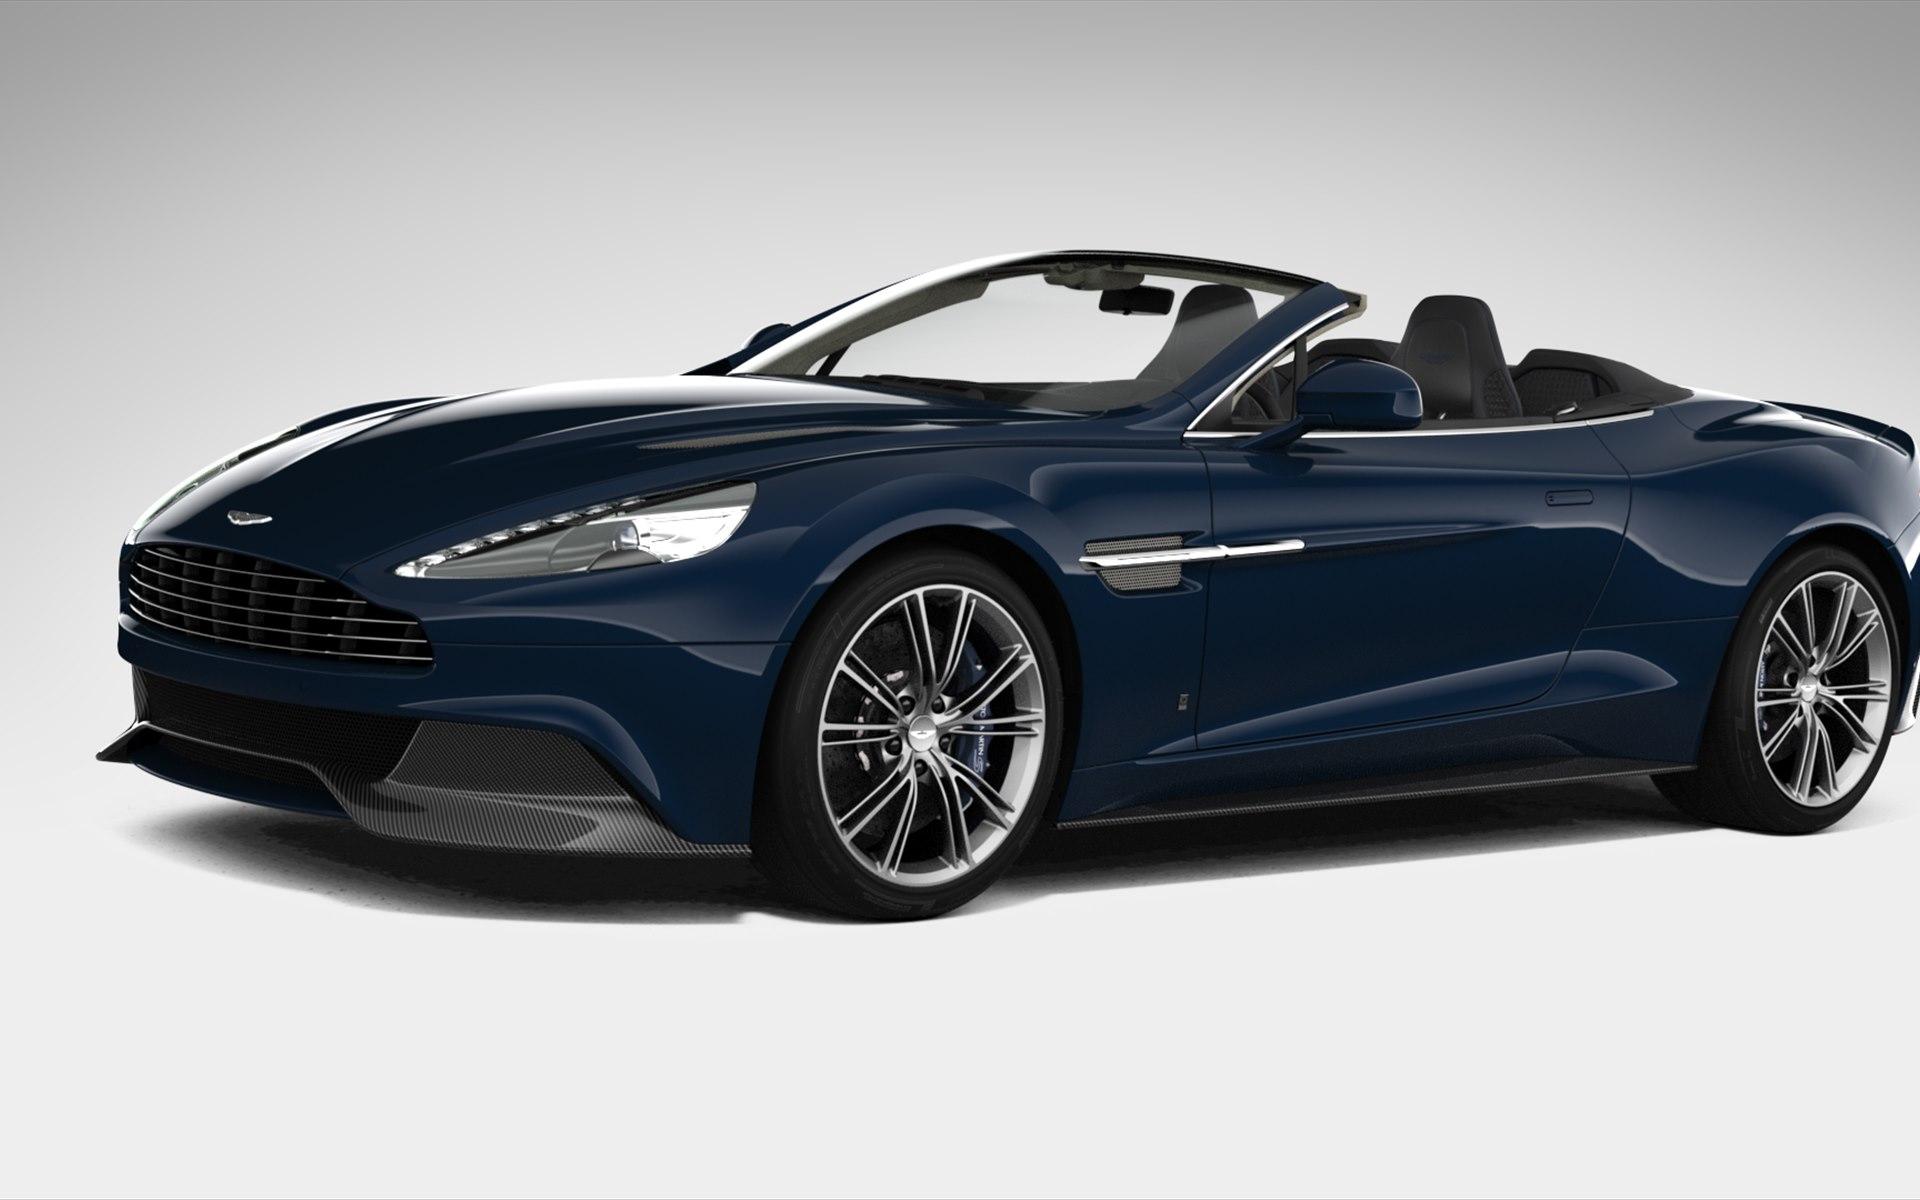 Martin Aston Martin Vanquish Volante Neiman Marcus Edition 2014 1920x1200